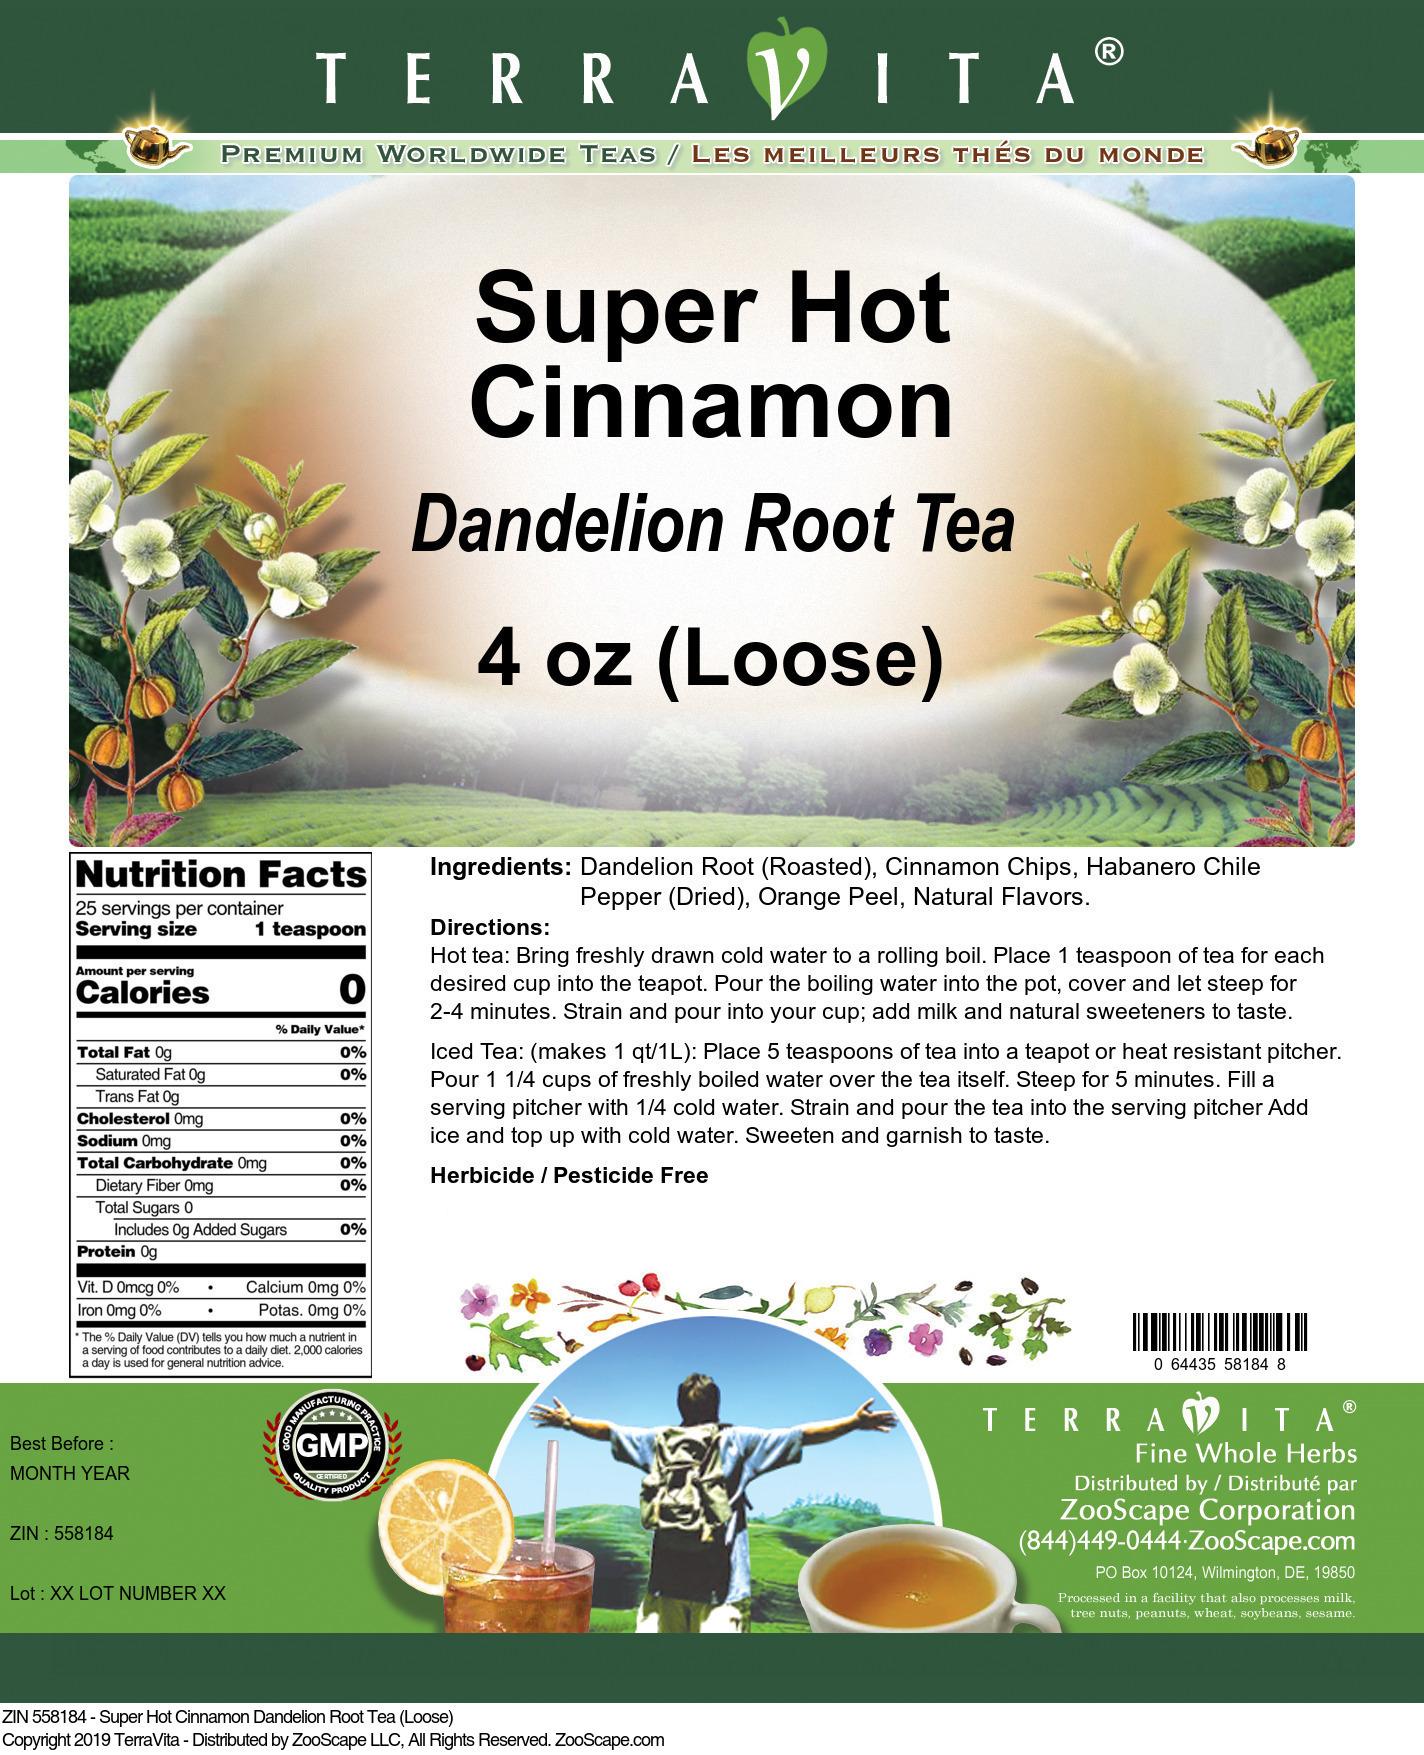 Super Hot Cinnamon Dandelion Root Tea (Loose)